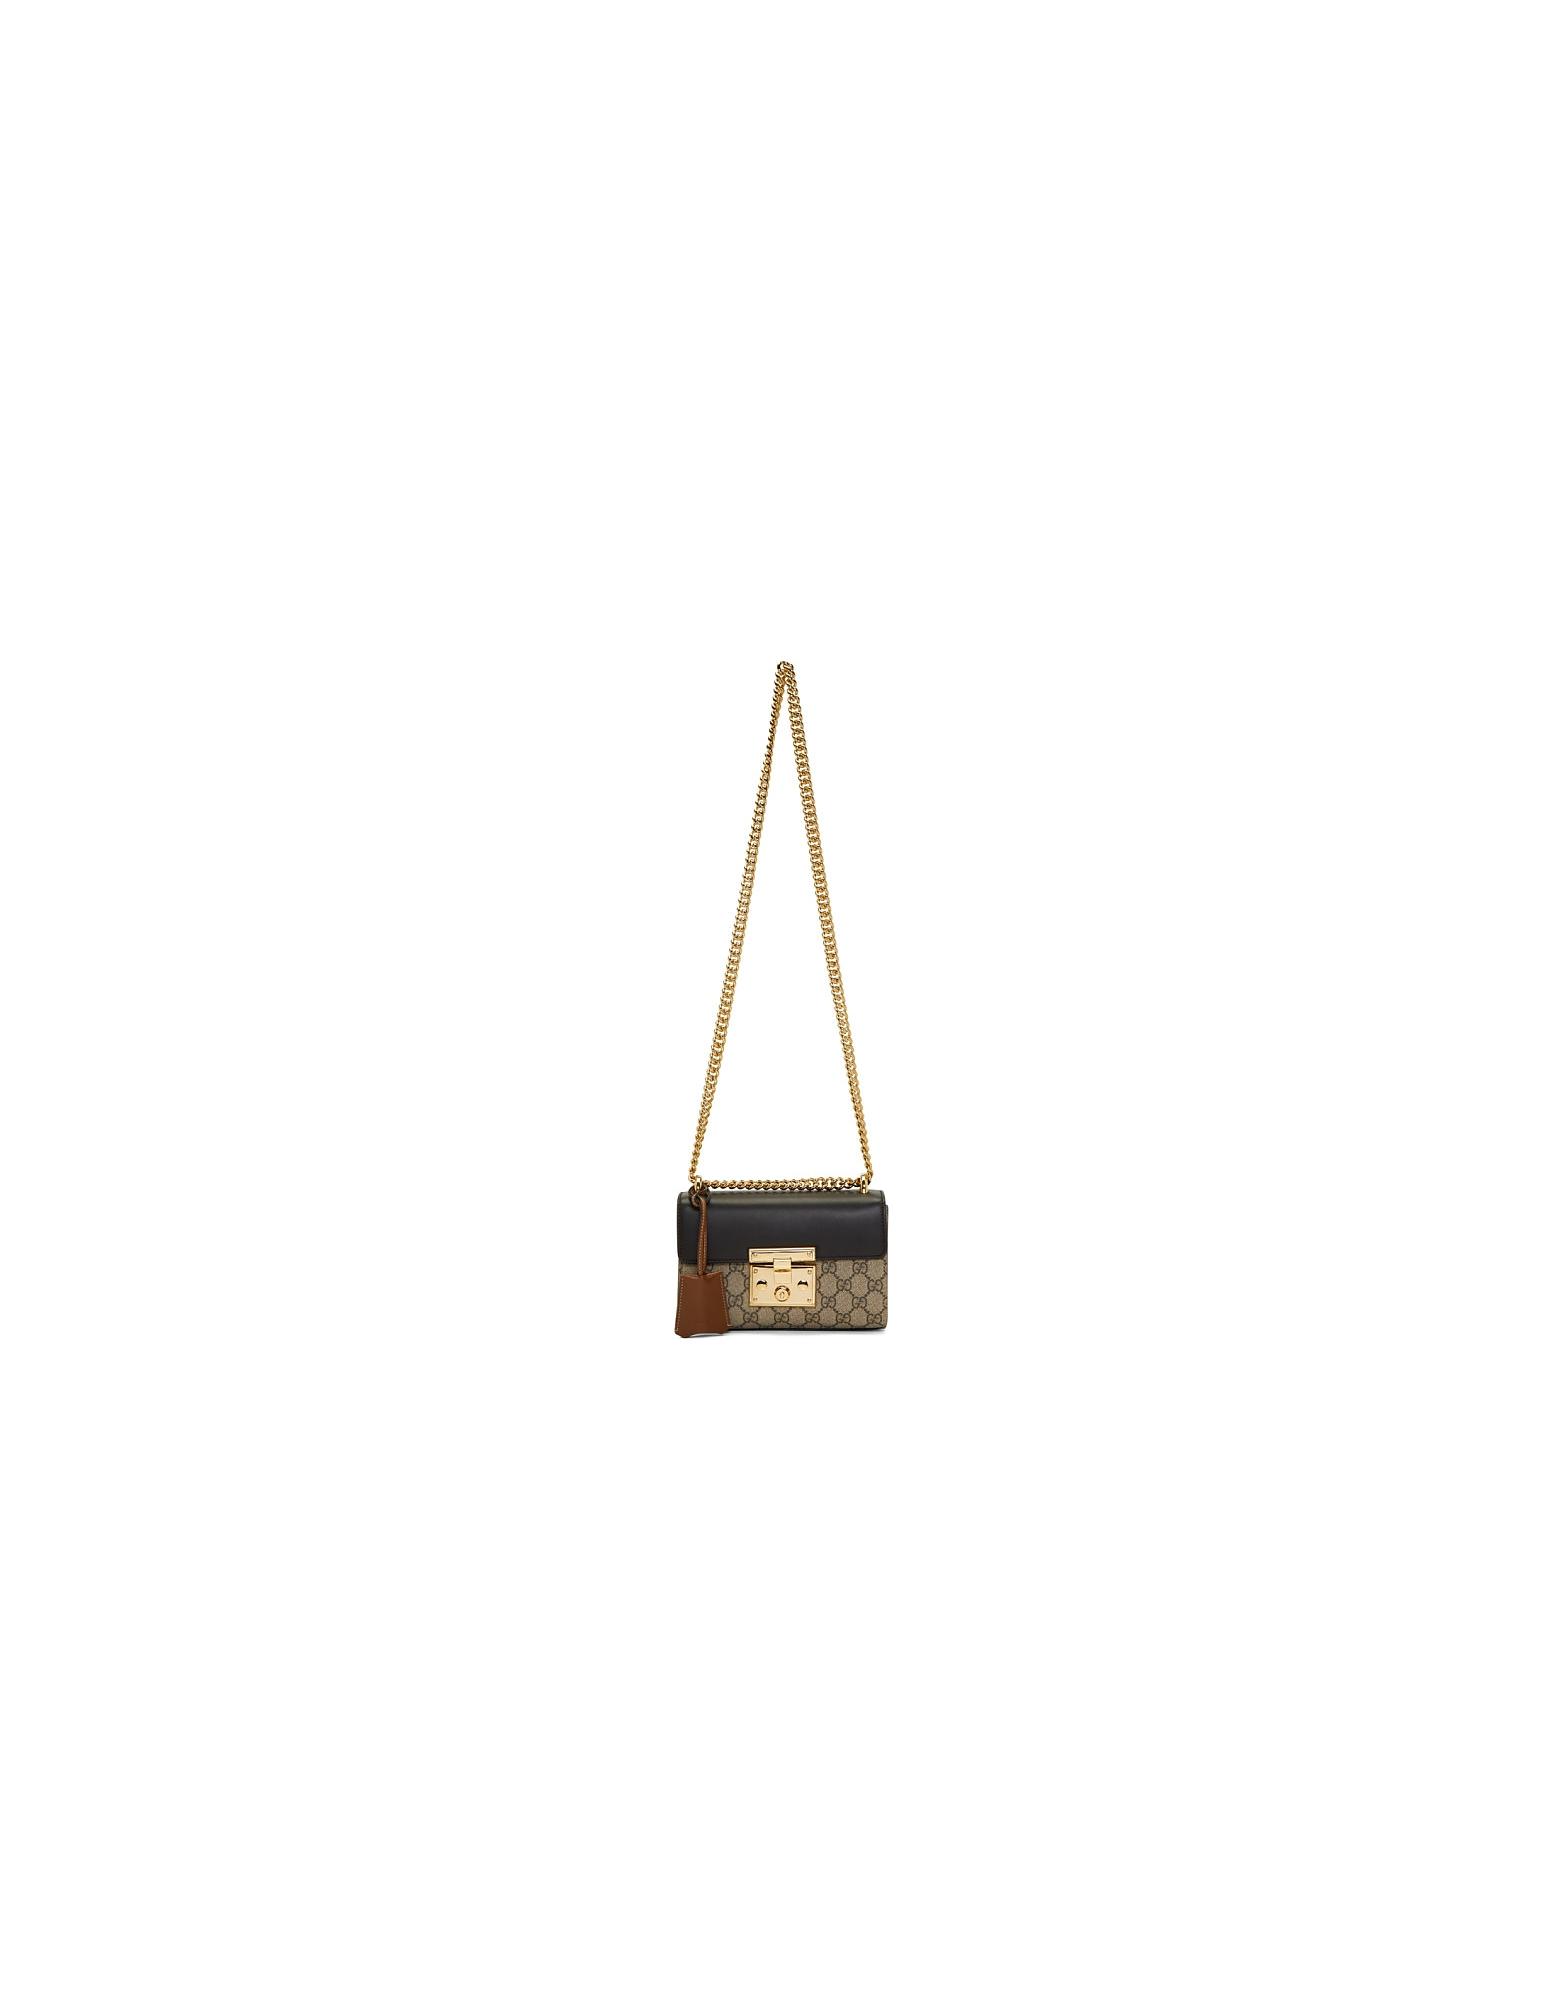 Gucci Designer Handbags, Black and Brown Small Padlock GG Shoulder Bag